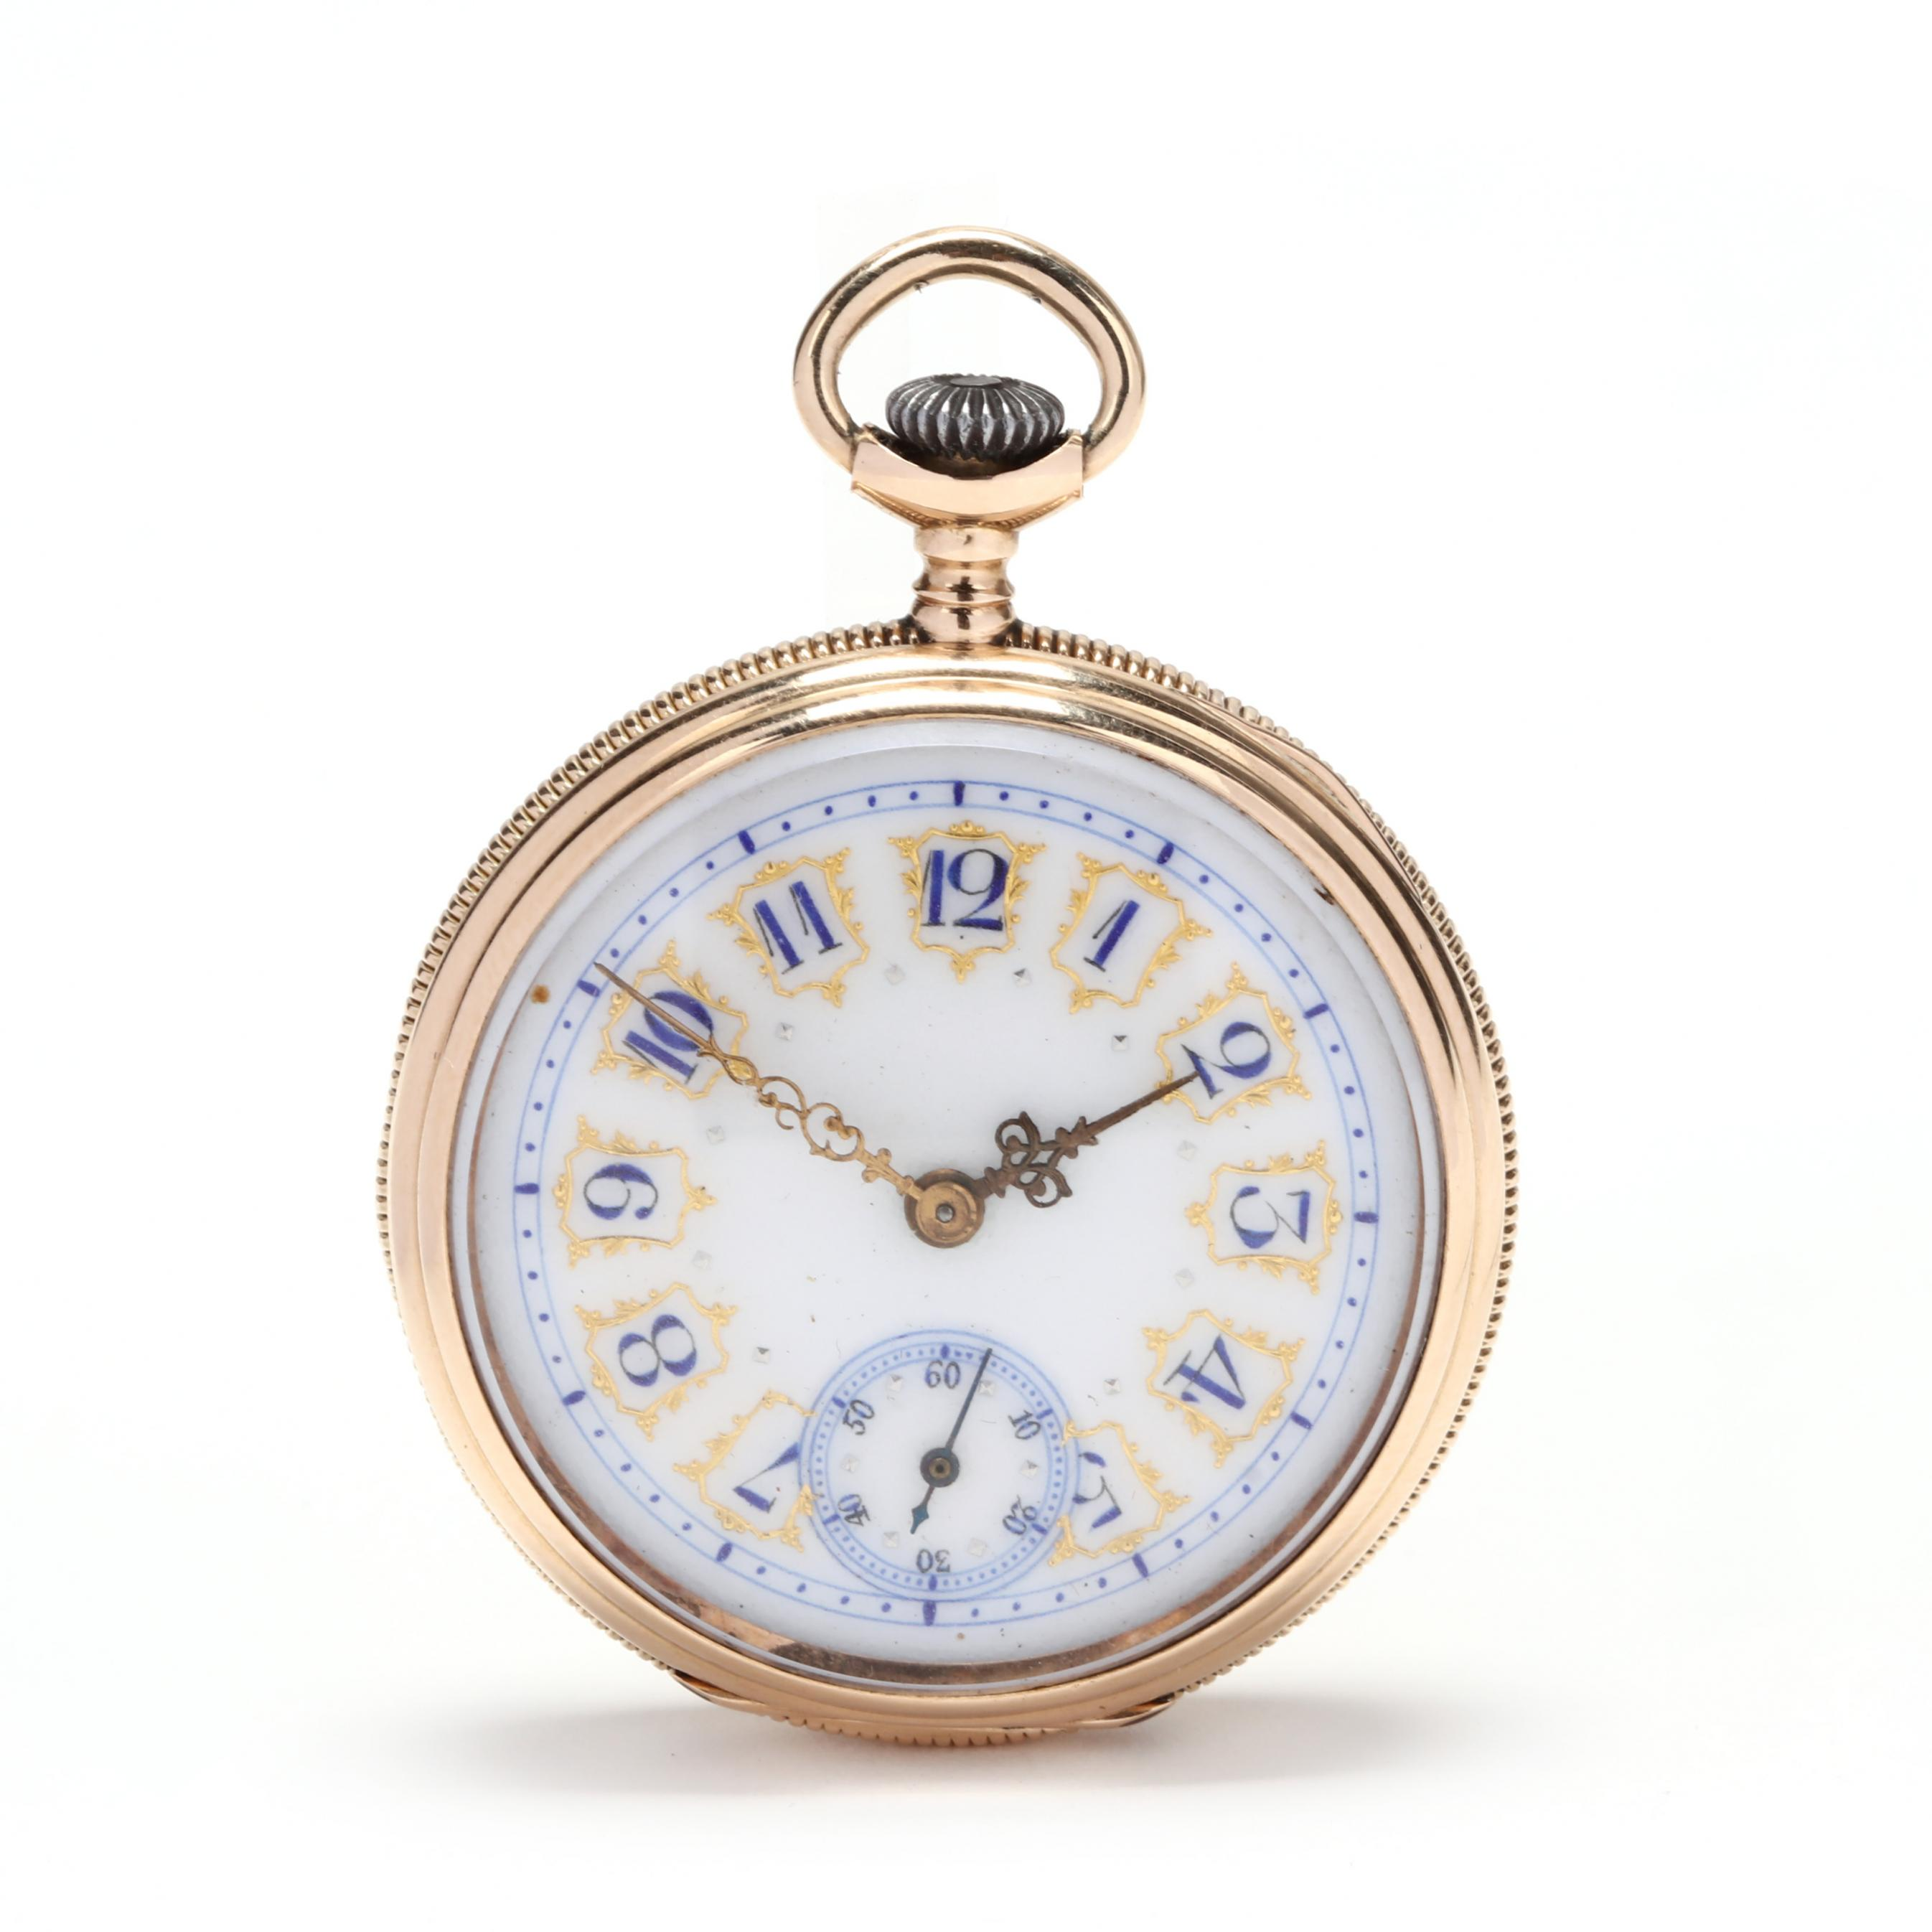 lady-s-antique-14kt-open-face-pocket-watch-longines